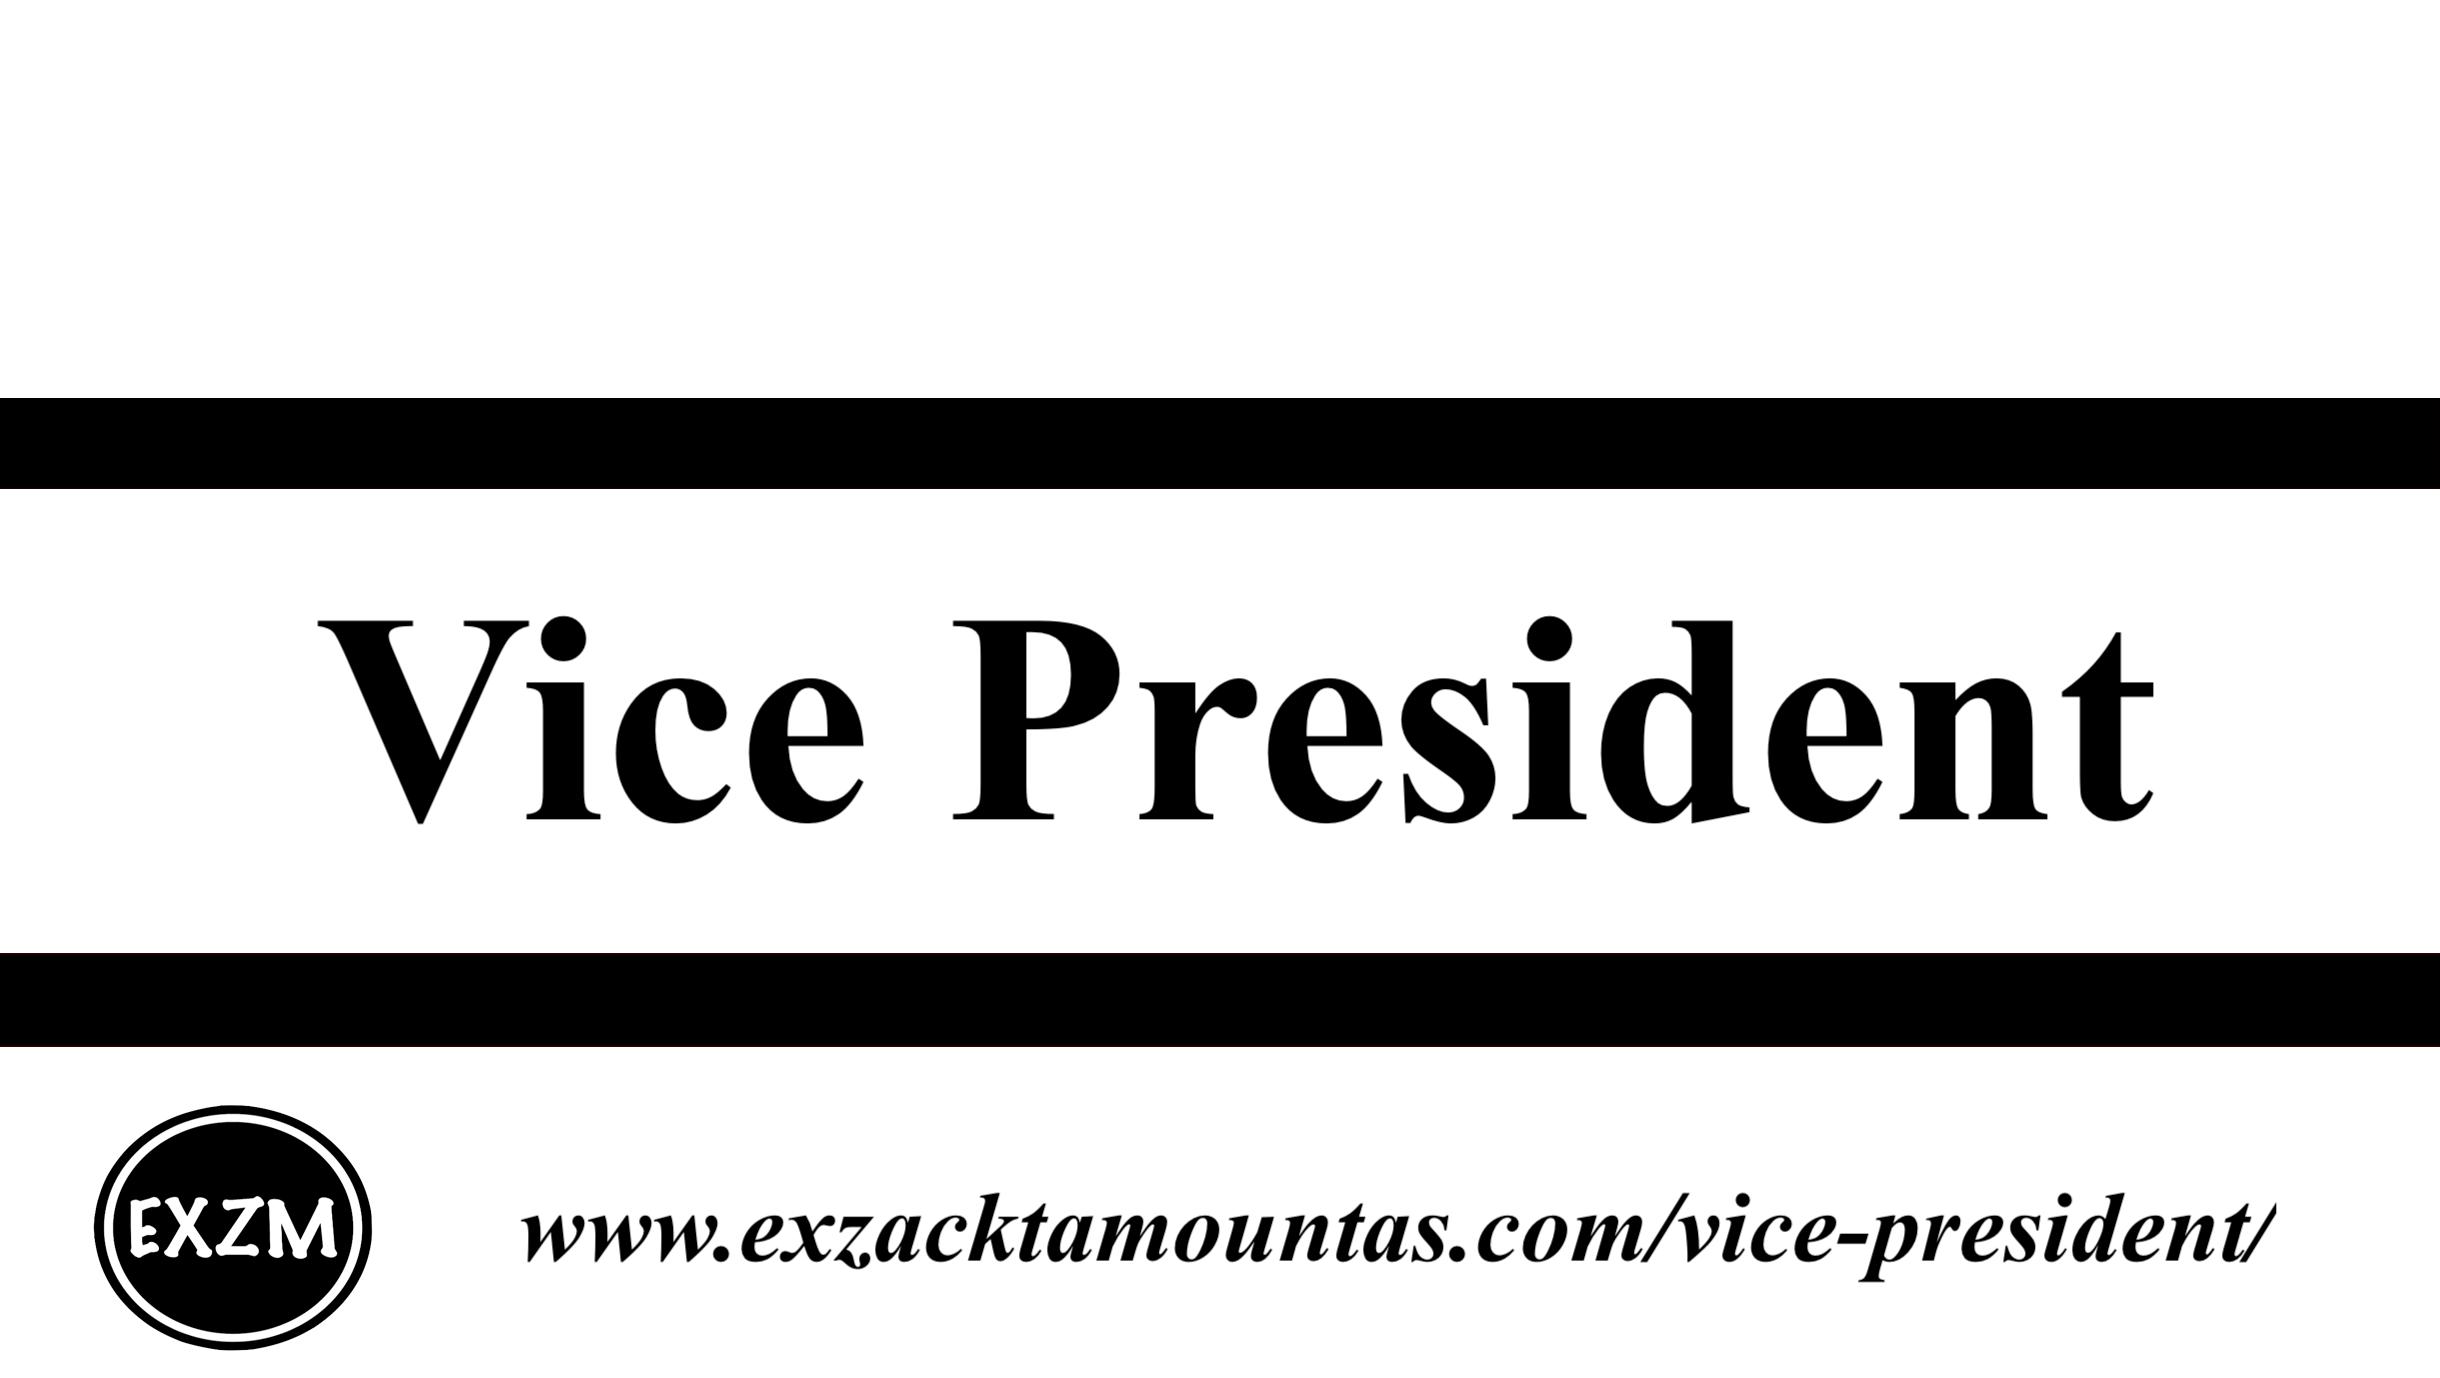 Vice President EXZM 10 1 2019